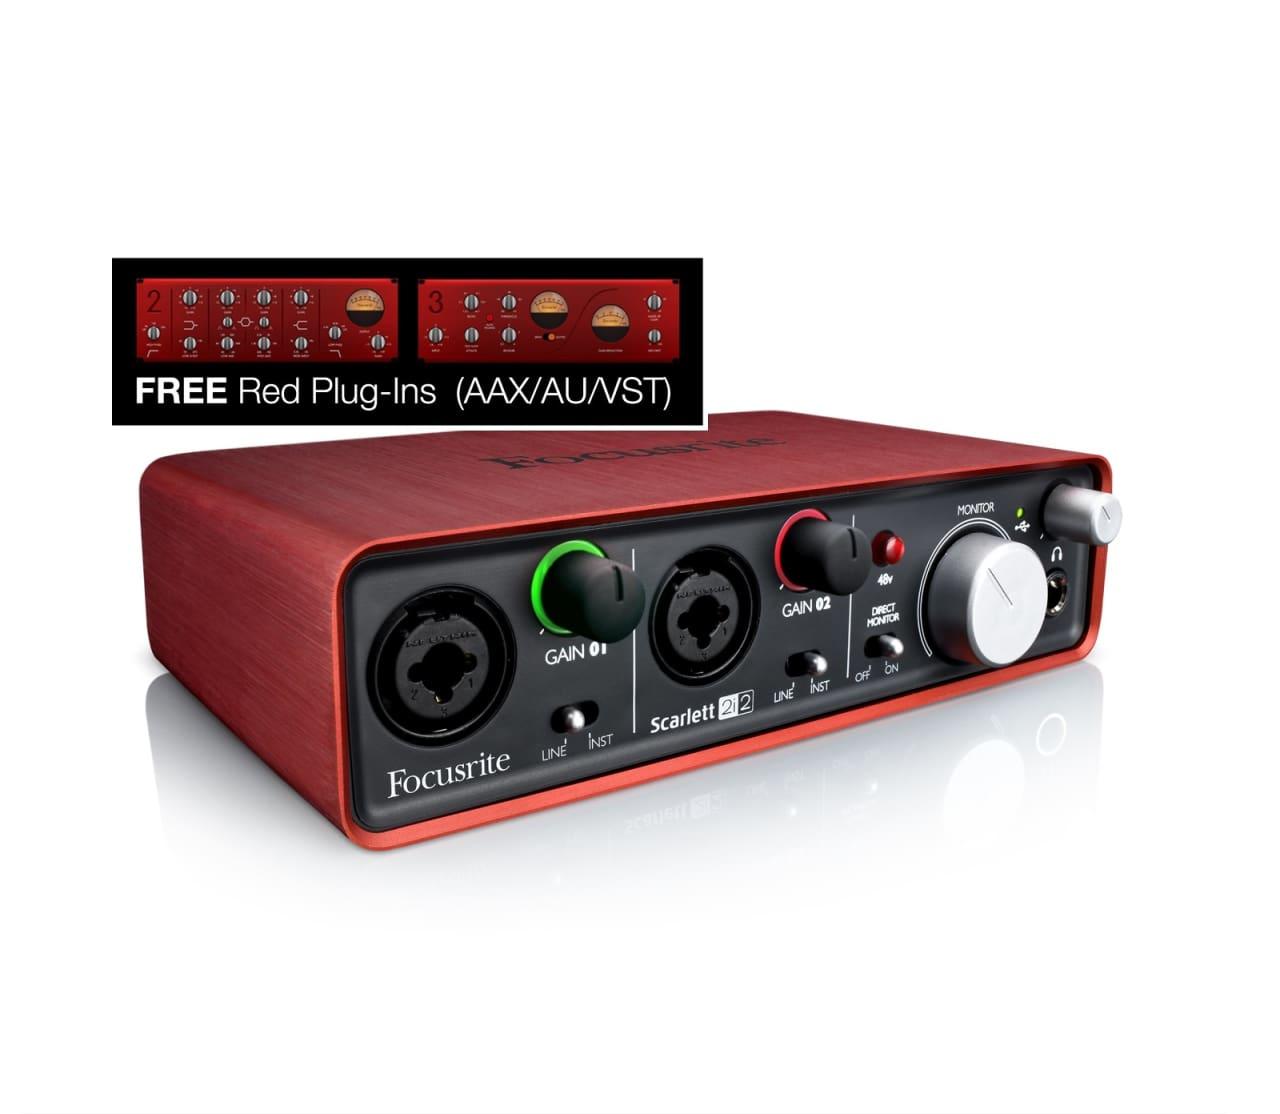 Focusrite Scarlett 2i2 USB Audio Interface | Reverb Scarlett 2i2